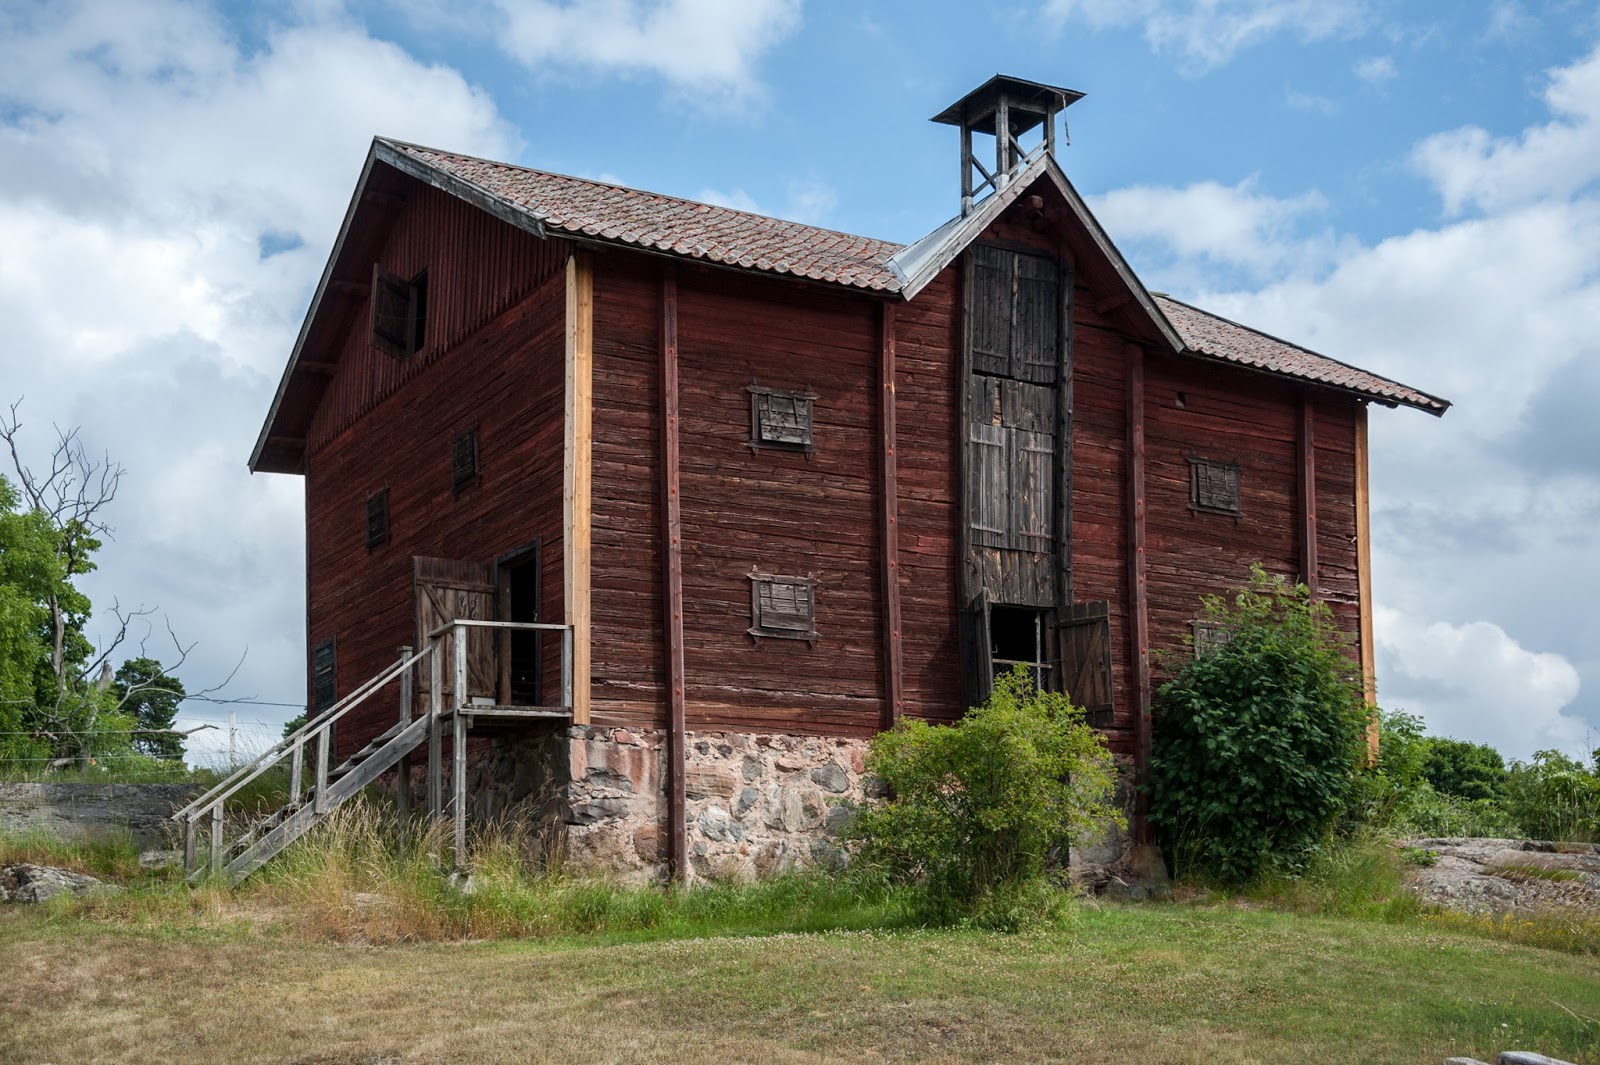 I Love Barns On Pinterest Old Barns Barns And Barn